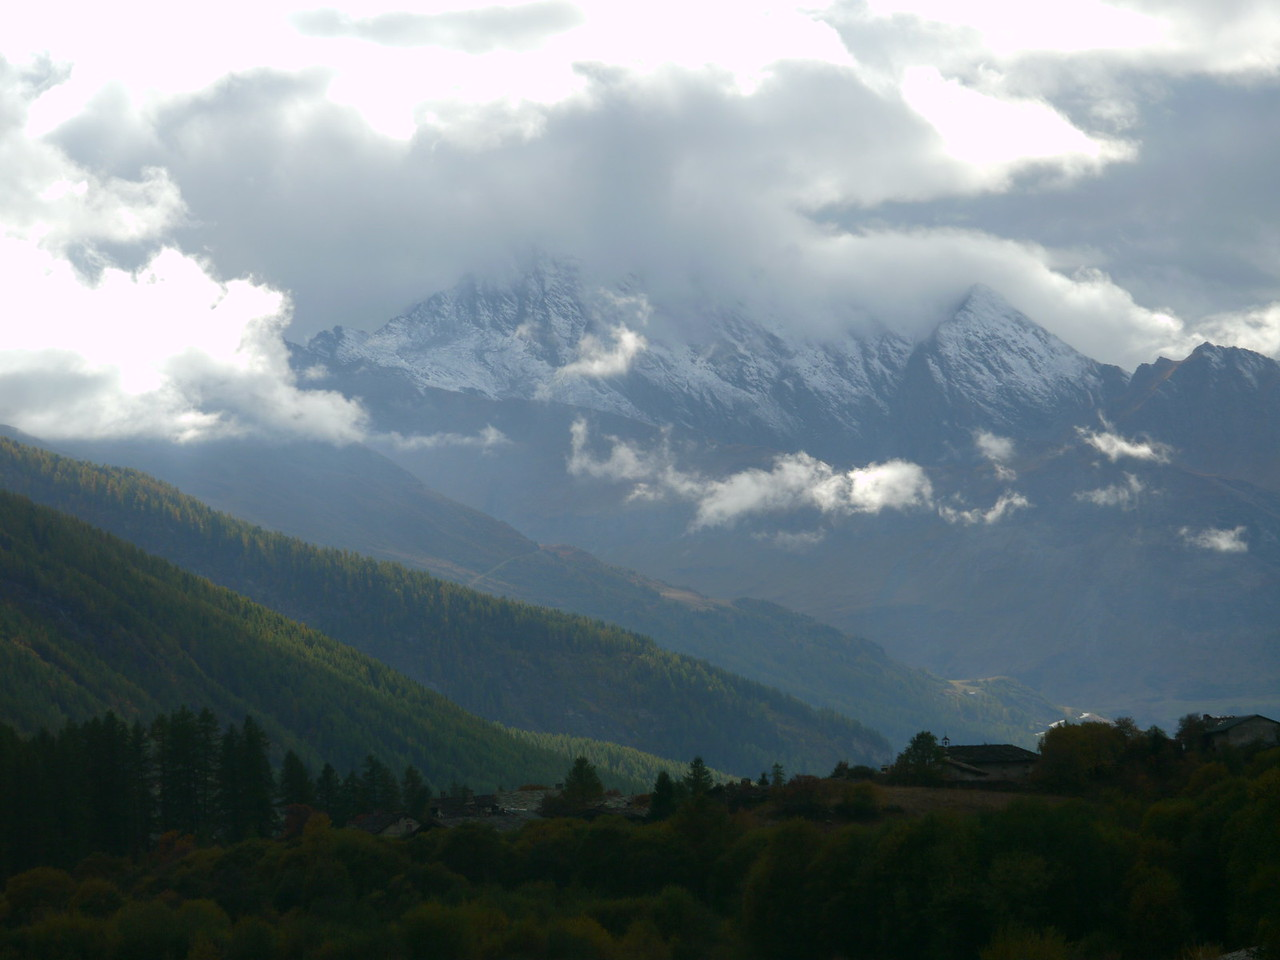 © RobAng 2010 -- Bessans, Rhône-Alpes, France - 1748.85 m